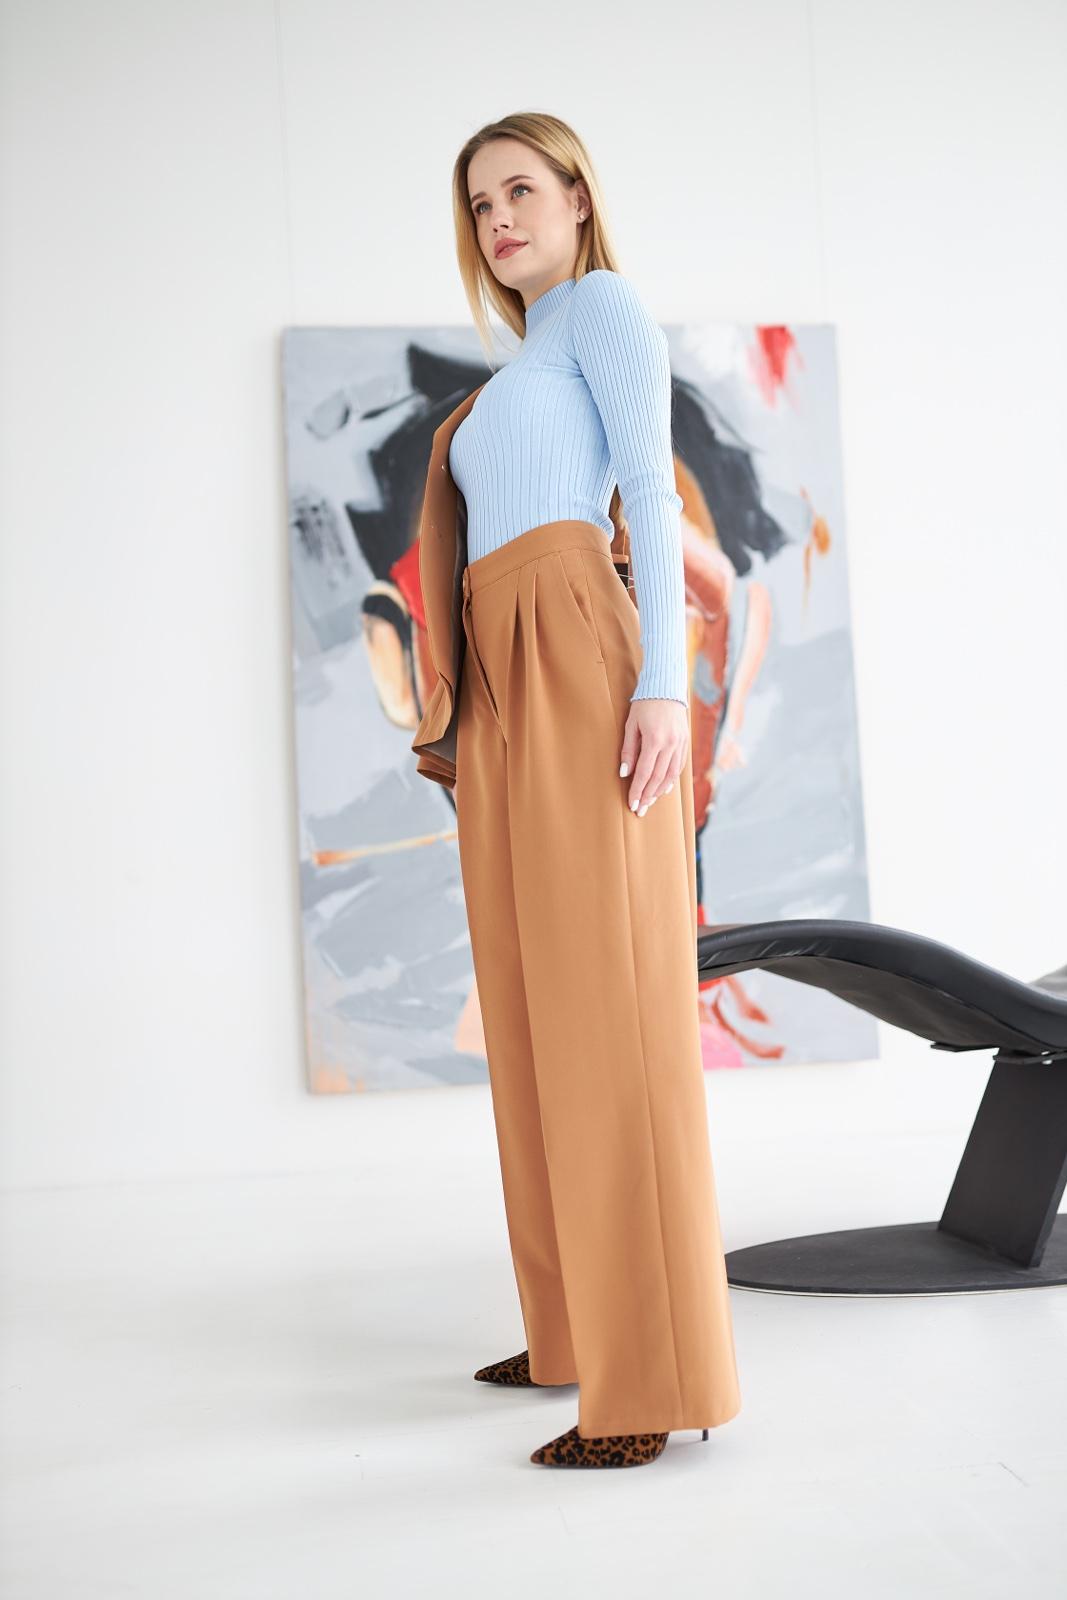 Kostyum ZHyuli 5 Купить верхнюю одежду оптом